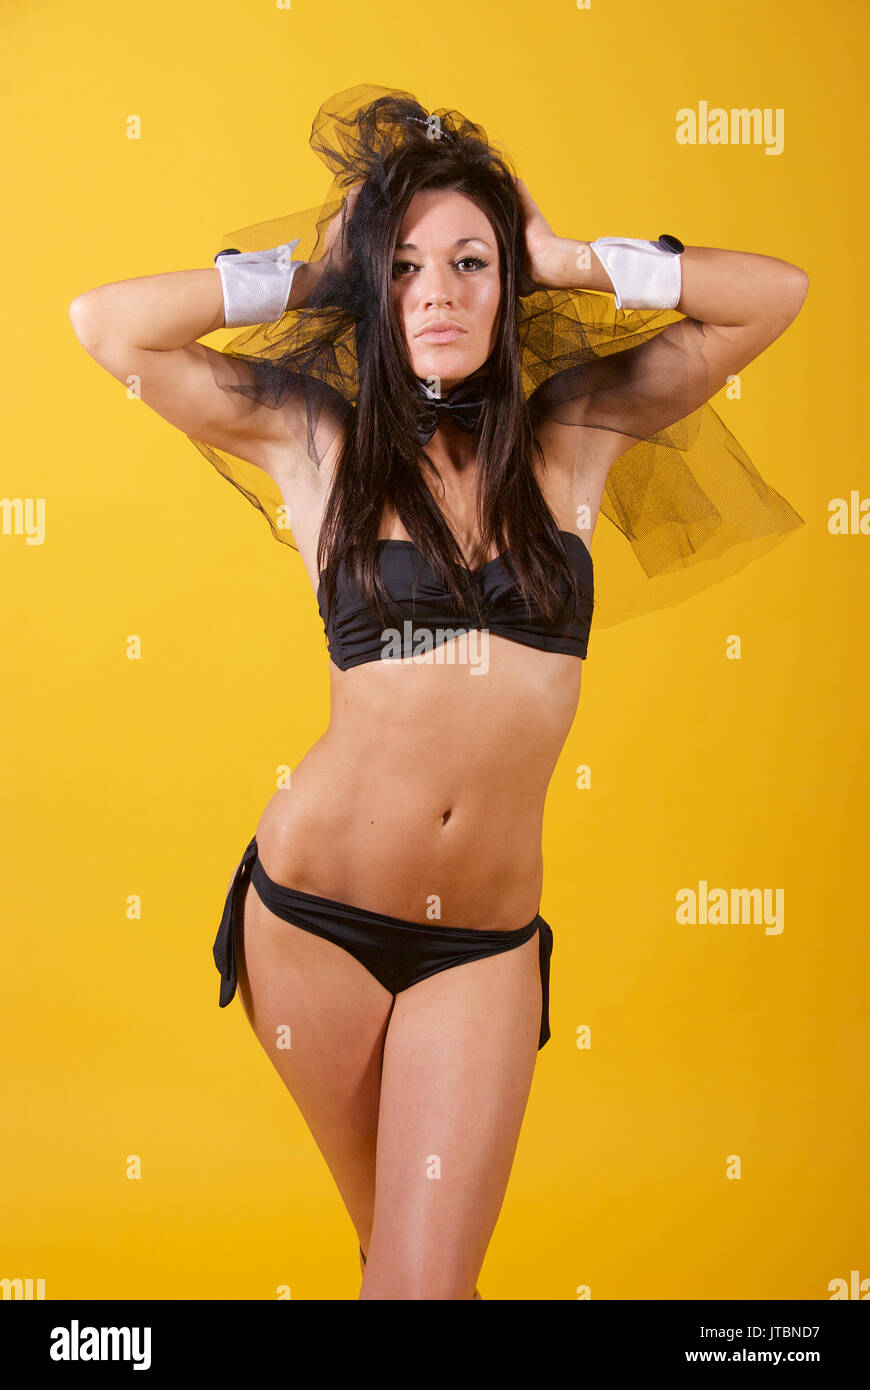 Beautiful brunette girl dancer in the studio wearing a black bikini and veil,  yellow background